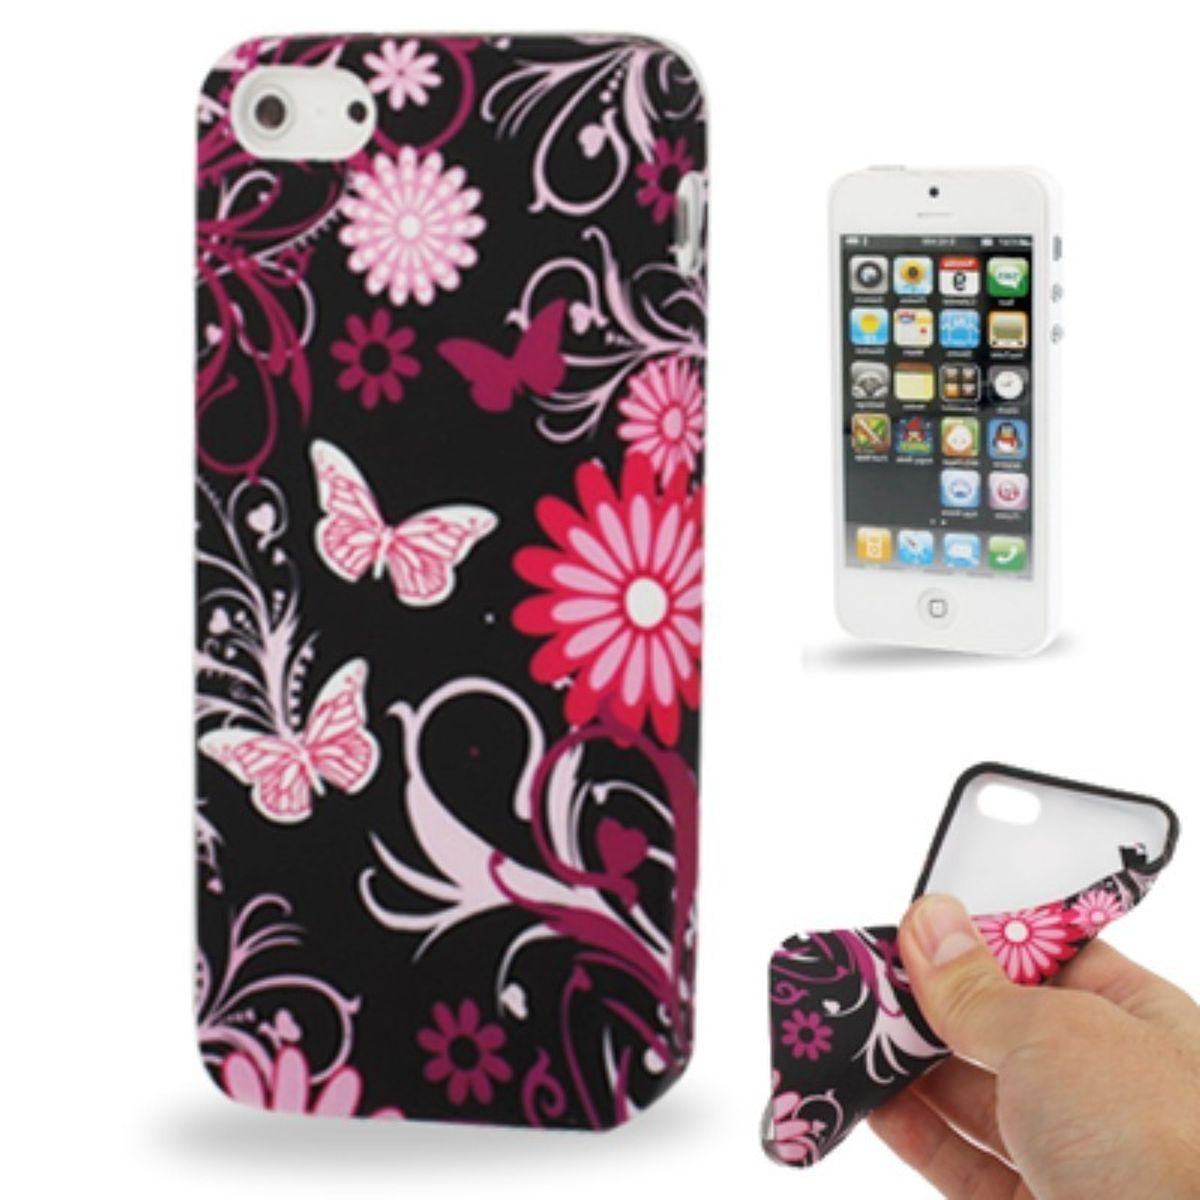 TPU Backcover Hülle für Handy Apple iPhone SE Schmetterling Pink